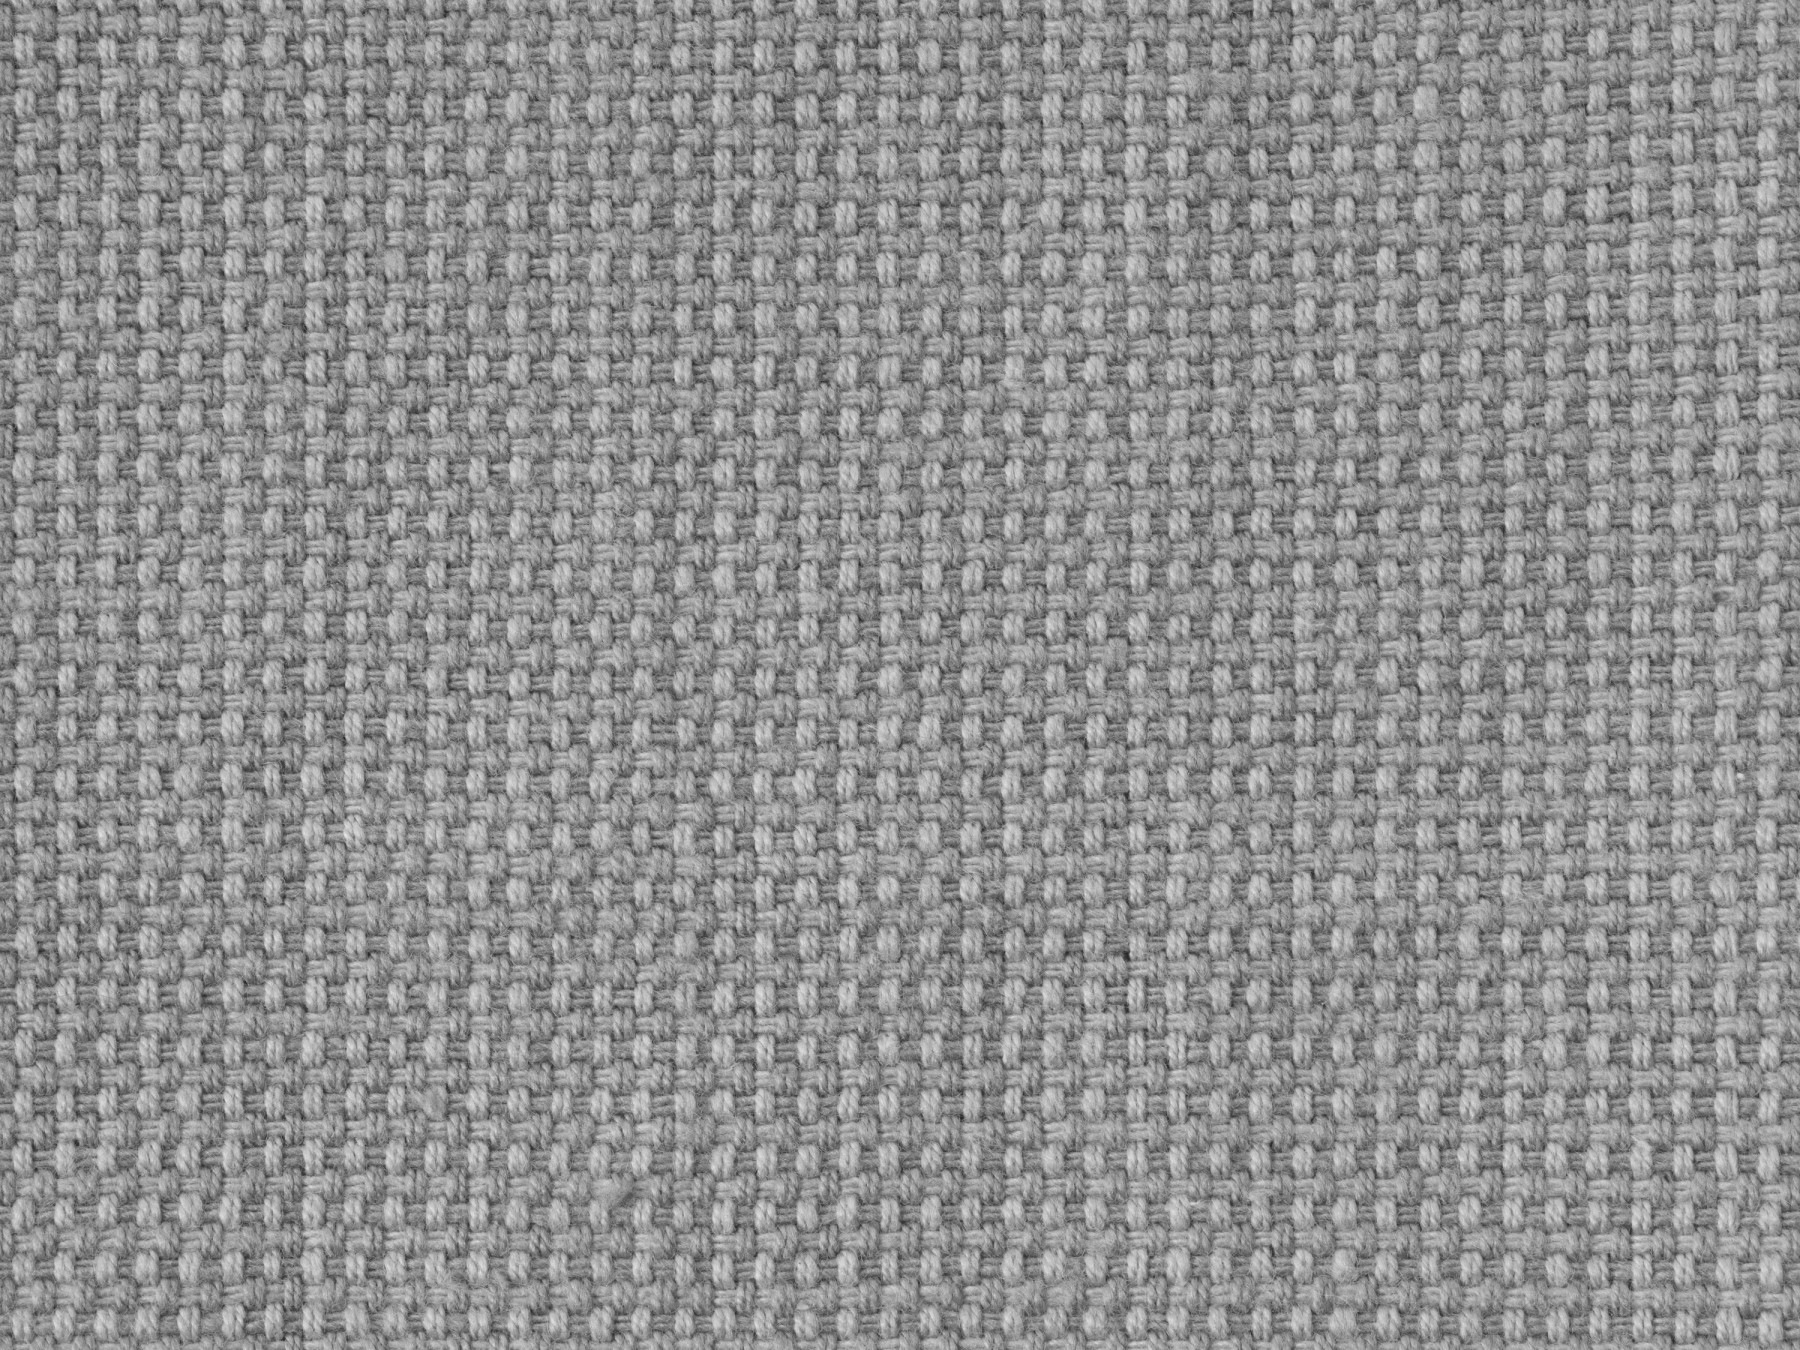 vipp Tea Towel 2er Set VIPP121, 12101, 5705953163257